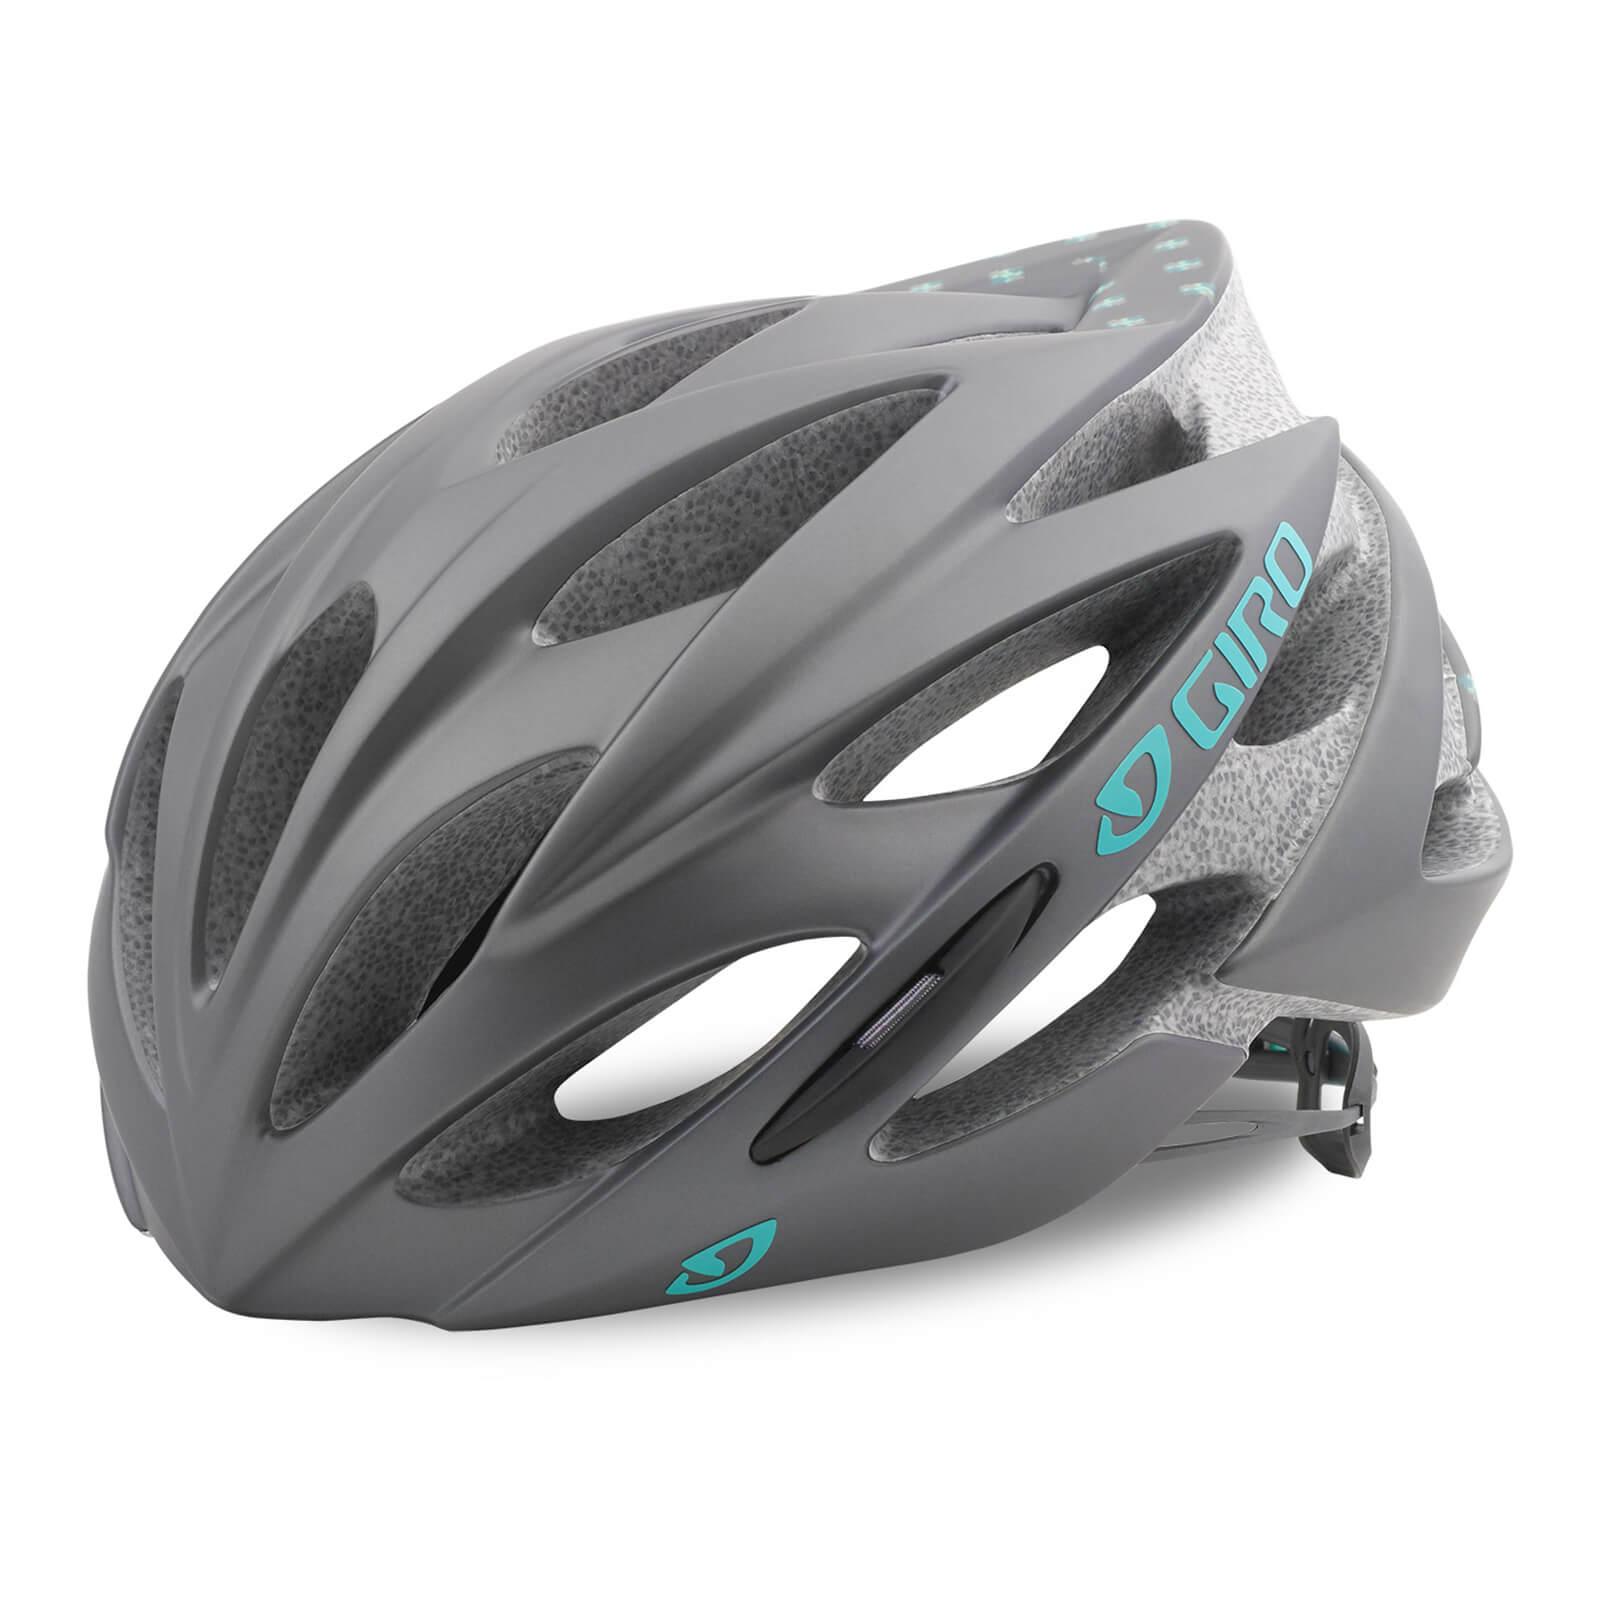 Giro Sonnet Women's Road Helmet - 2018 - S/51-55cm - Matt Titanium/Taos Dots